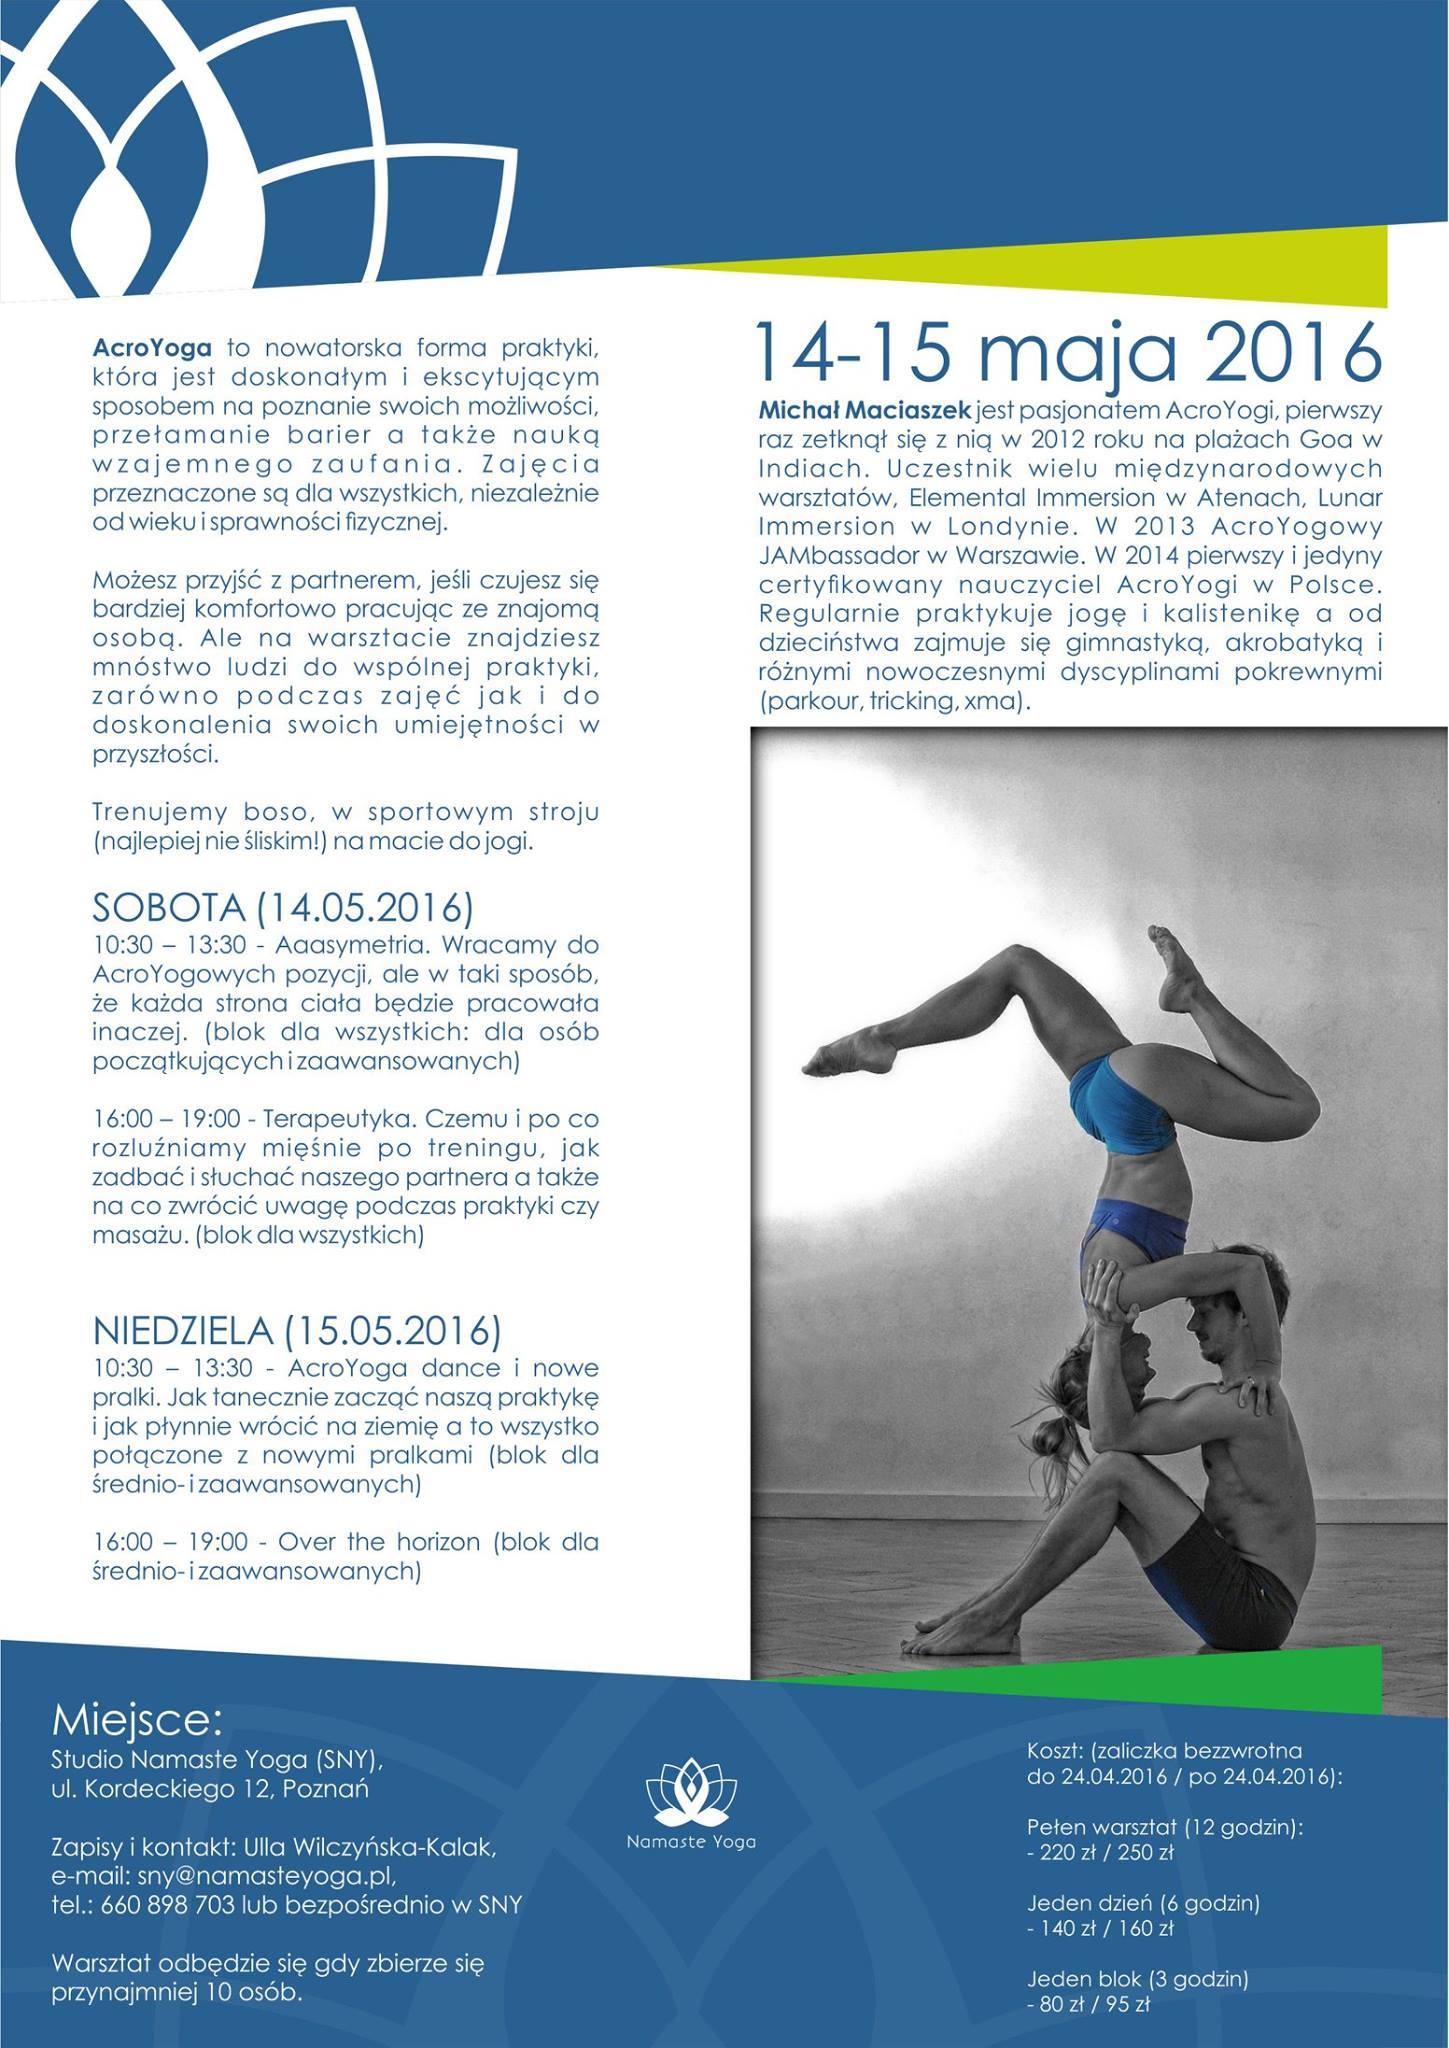 AcroYoga Poznań Warsztaty 14-15.05.2016